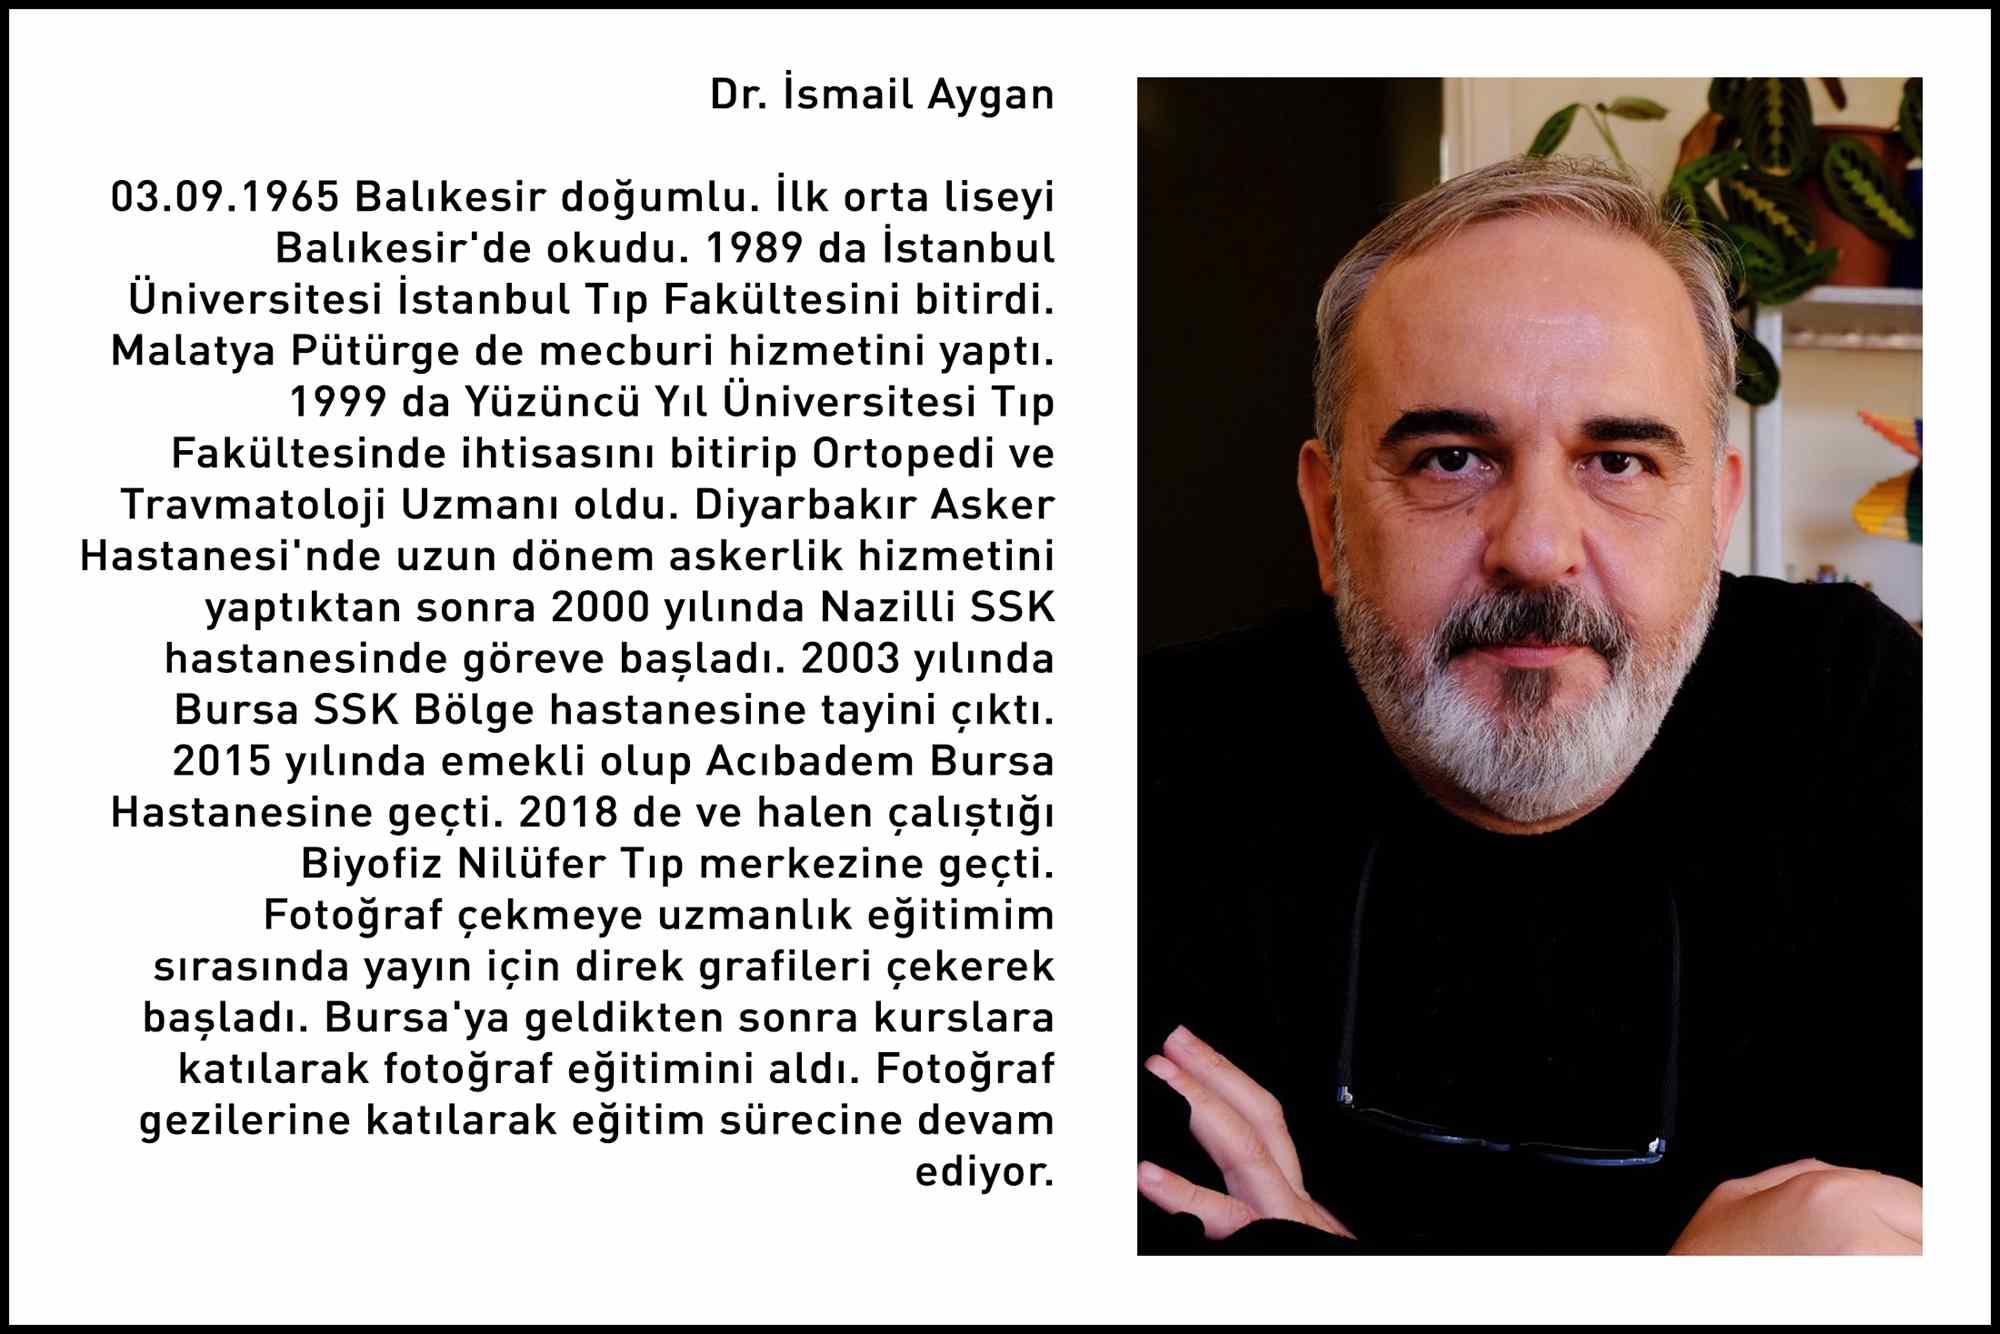 42_ismail-aygan-ozgecmis